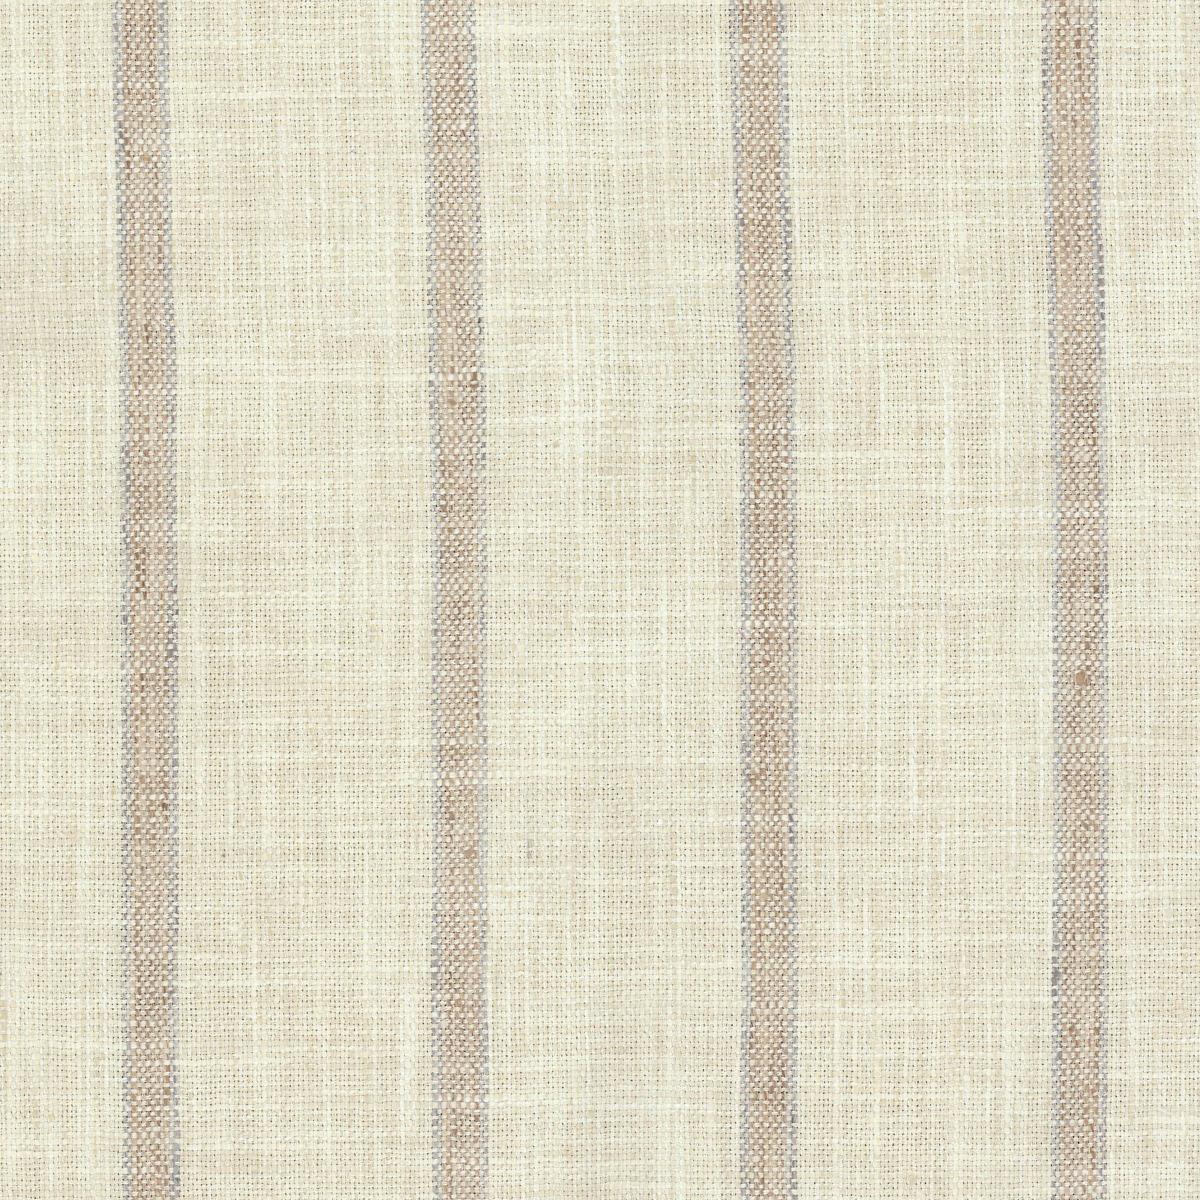 Glendale Stripe Natural/Grey Indoor/Outdoor Fabric